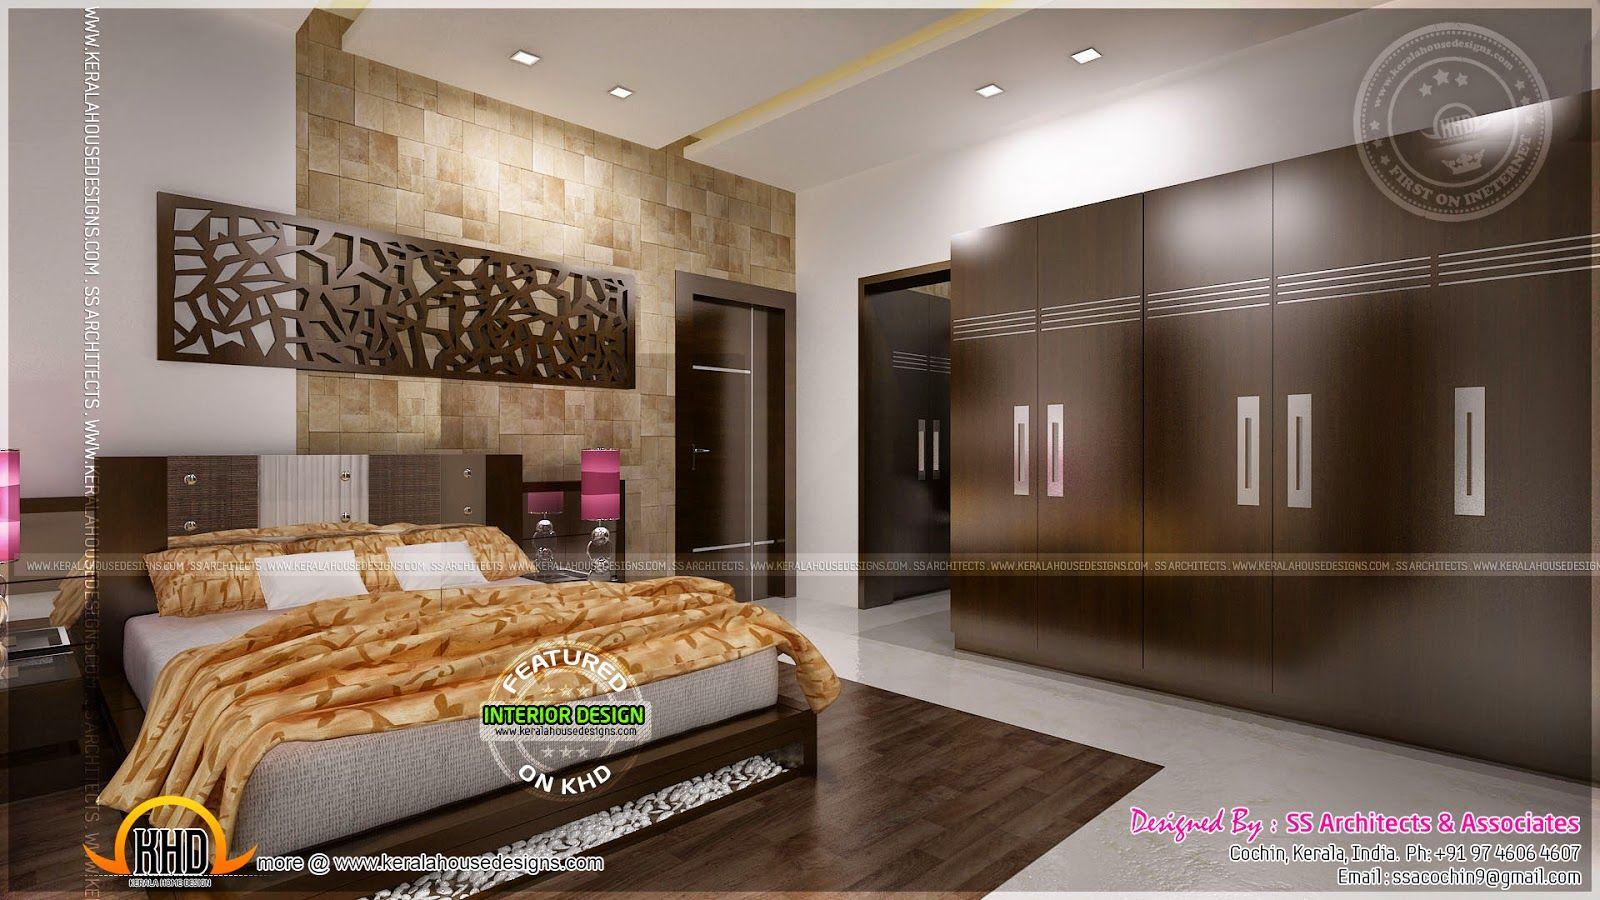 Indian Bedroom Interiors Google Search Master Bedroom Interior